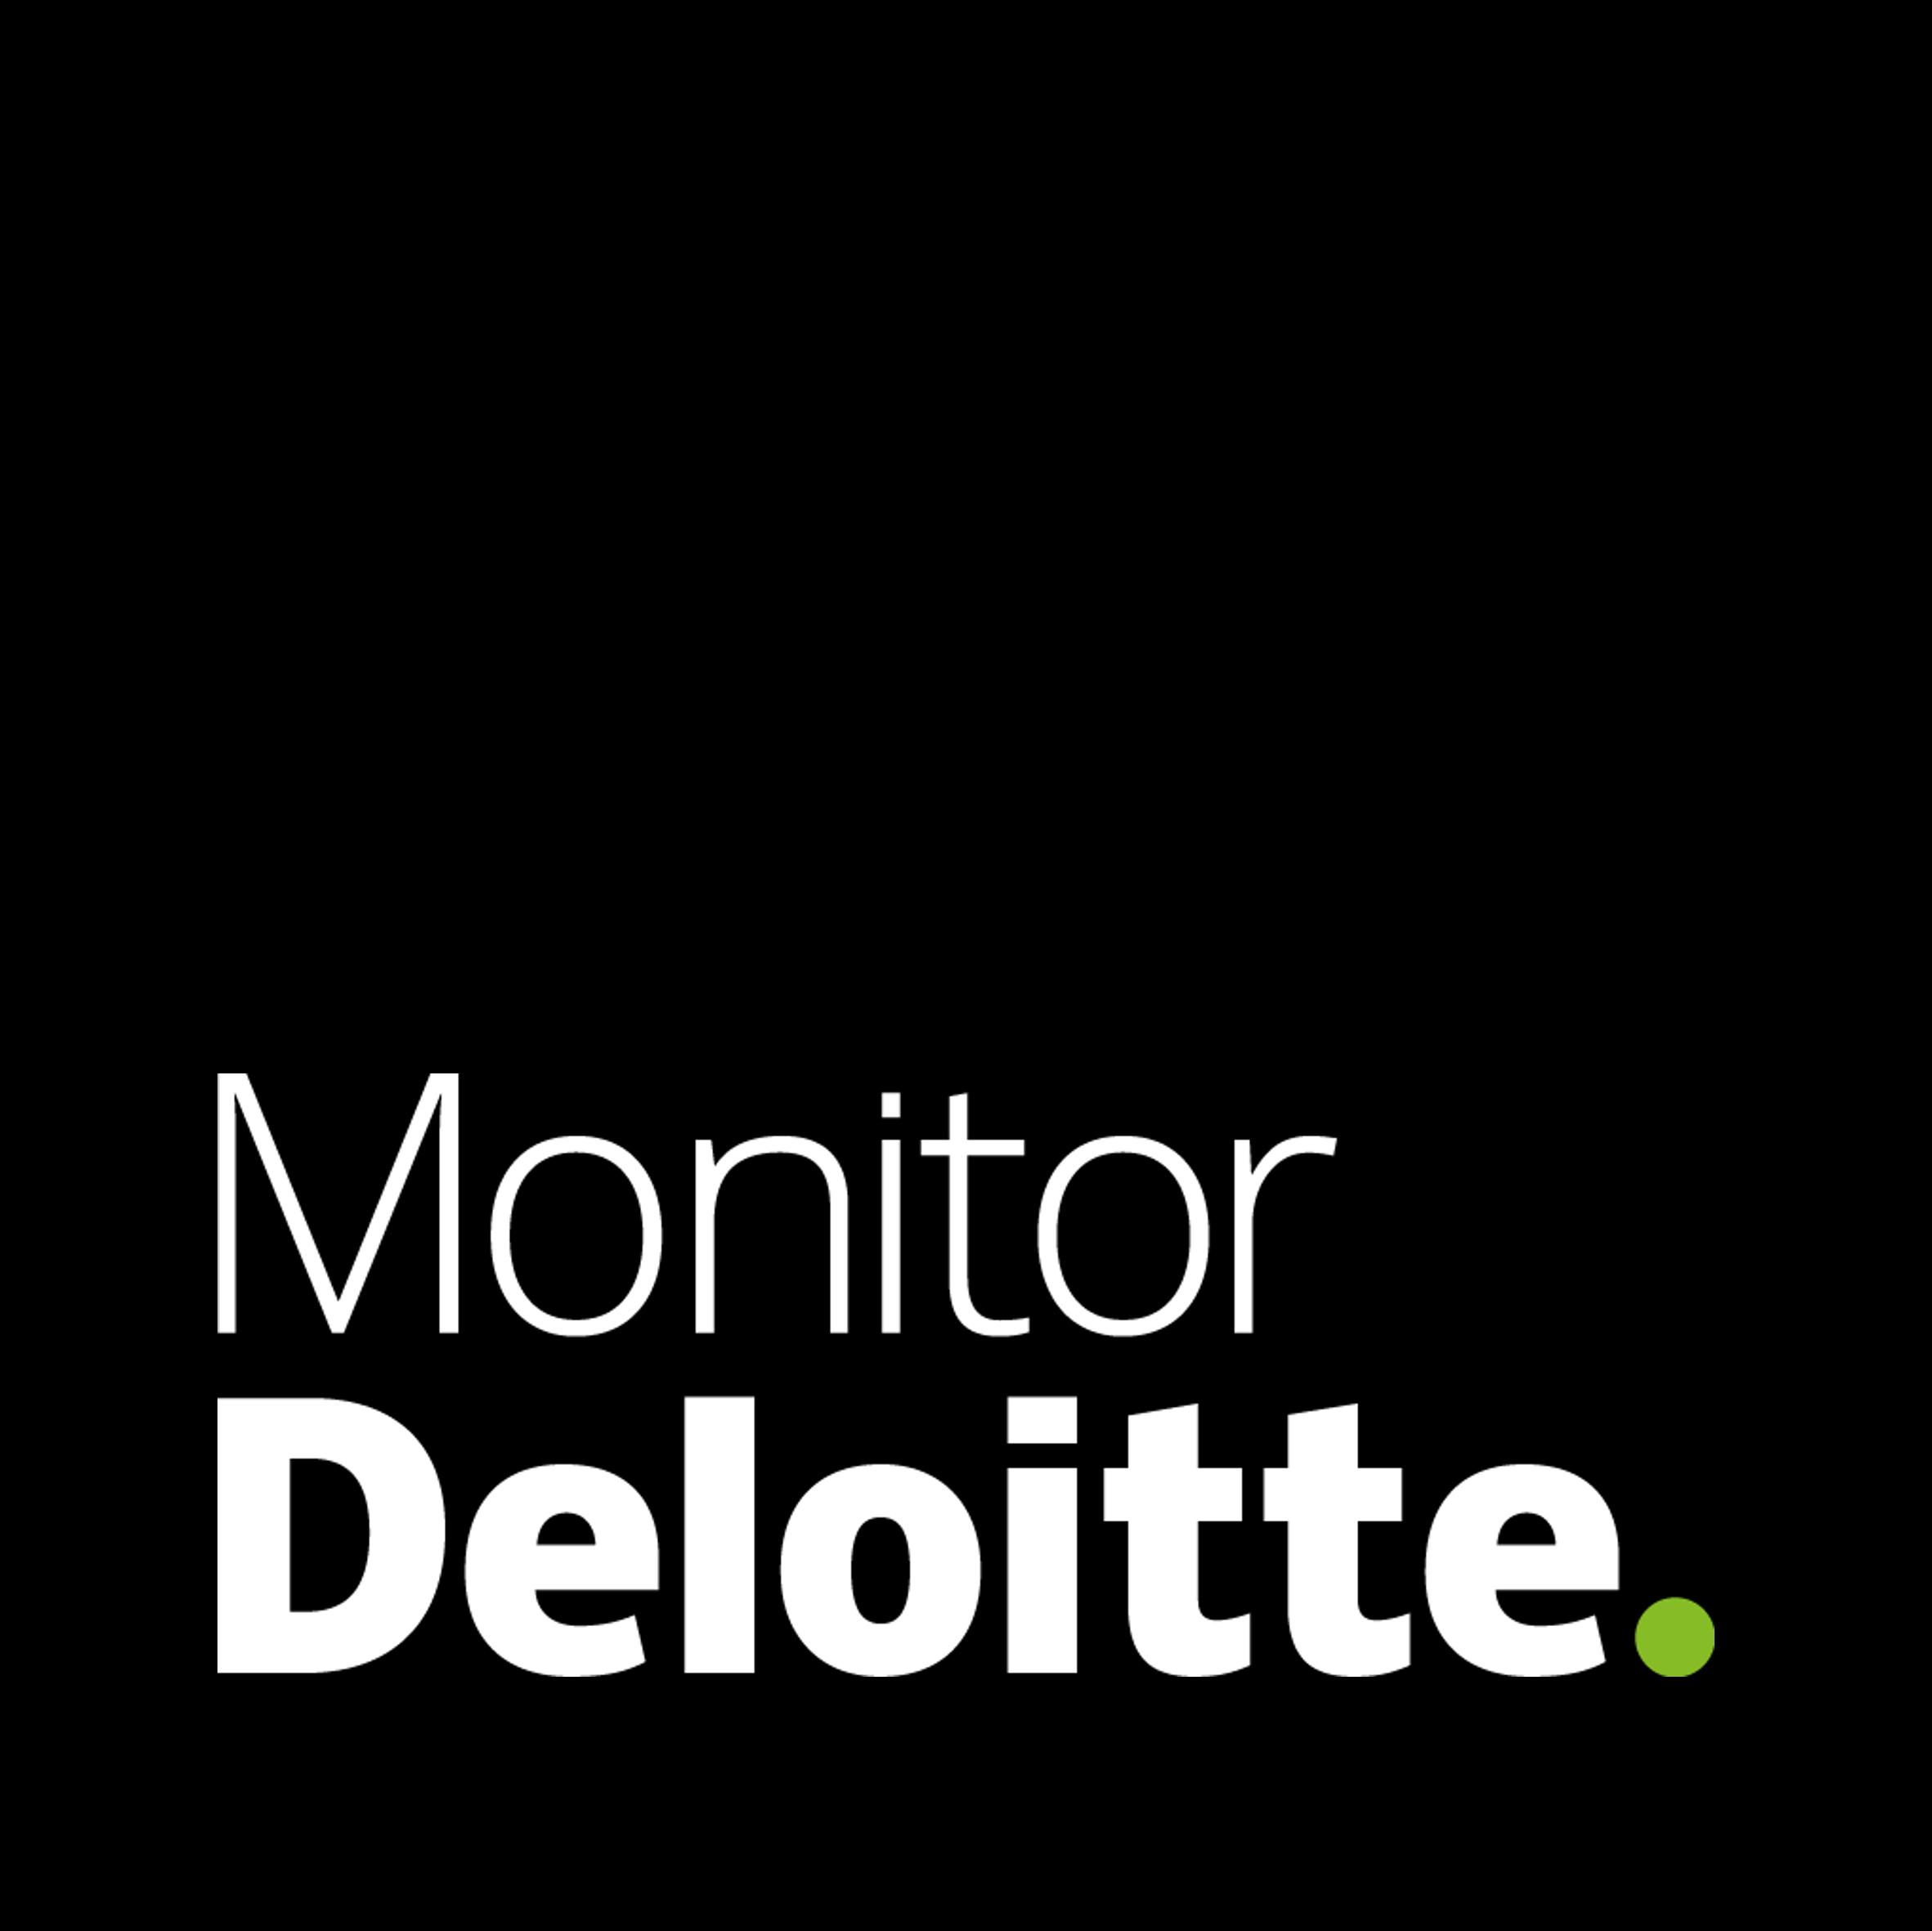 File:Monitor Deloitte logo.png.